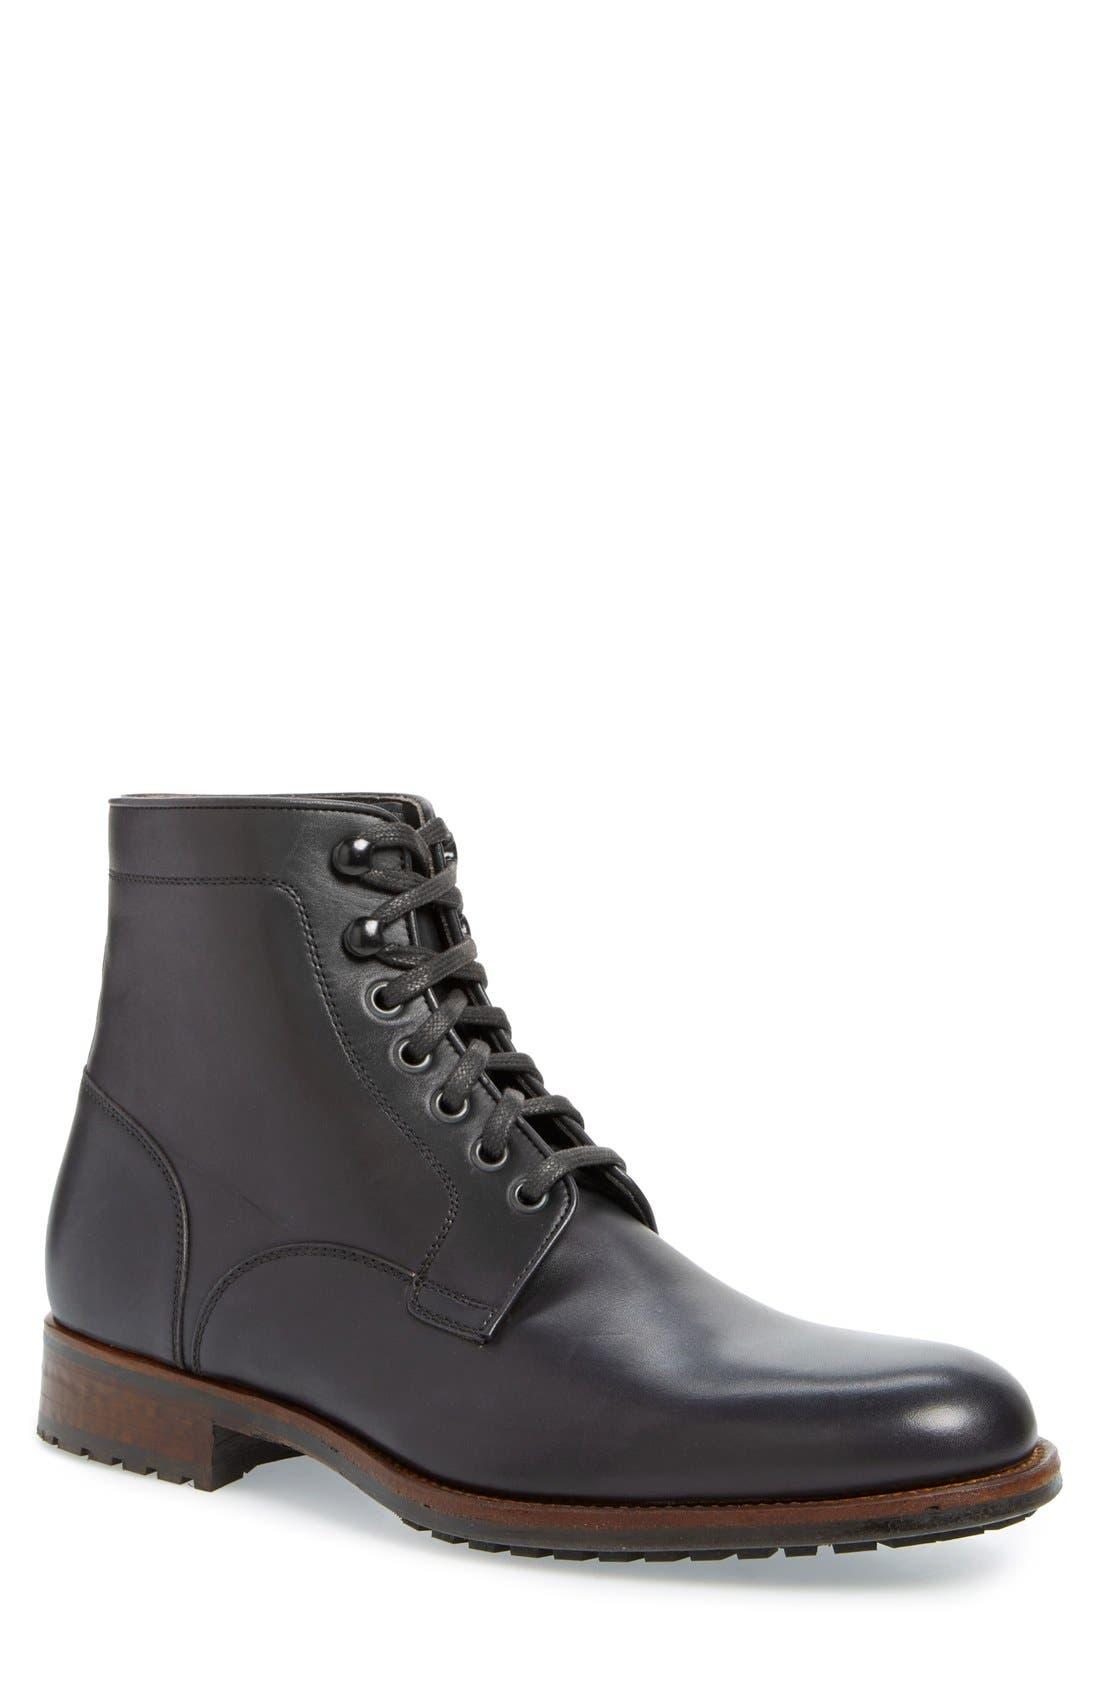 'Marcelo' Plain Toe Boot, Main, color, 001